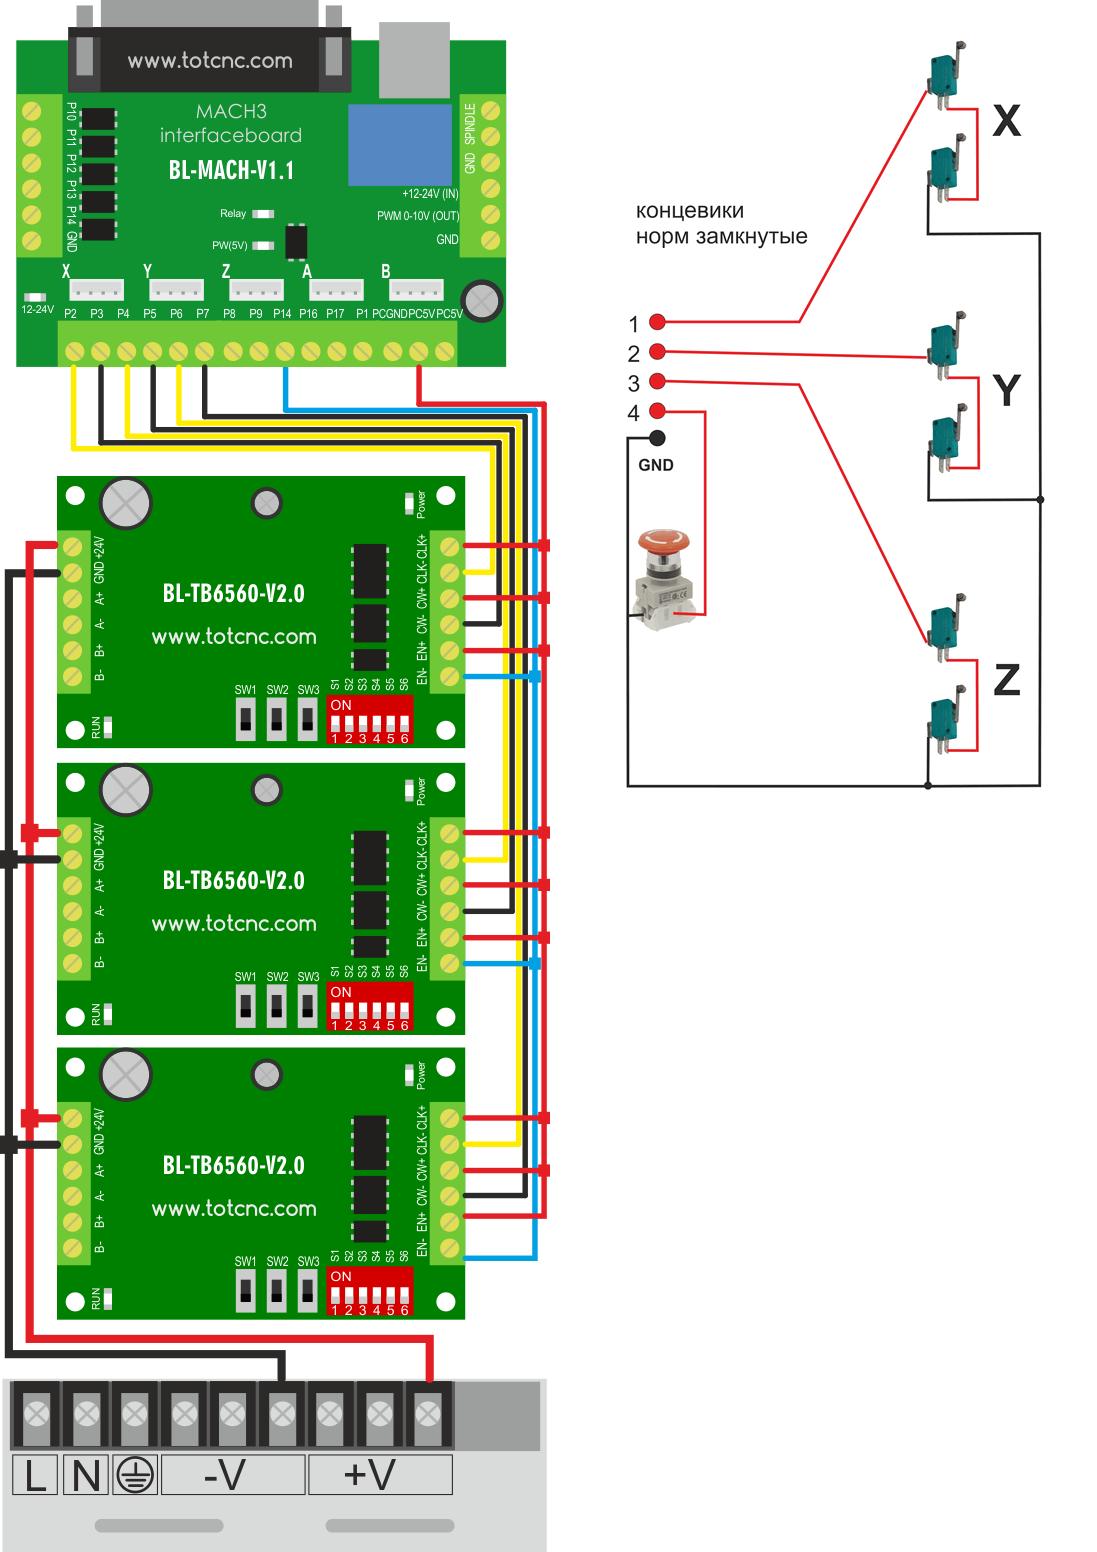 Tb6560 Wiring Diagram - Wiring Diagram Schema - Tb6560 Wiring Diagram